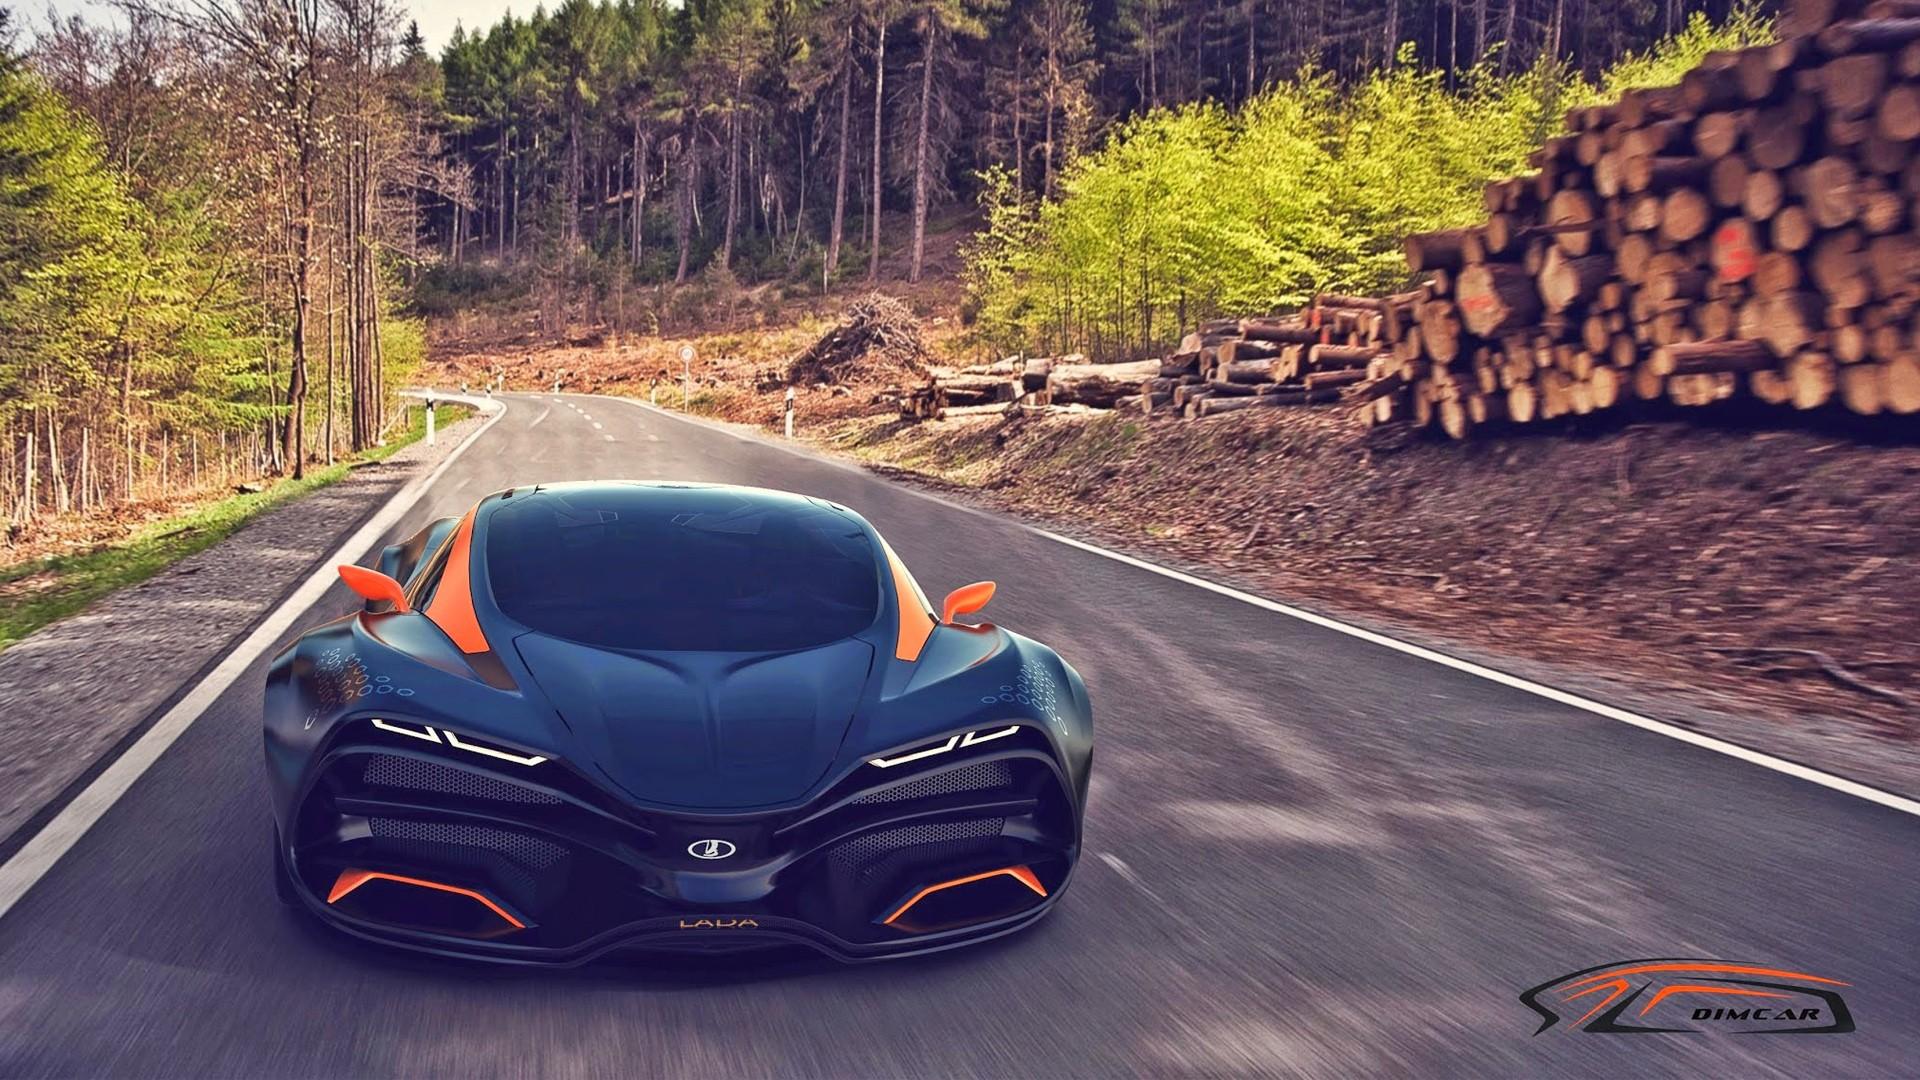 2015 lada raven supercar concept wallpaper hd car - Cars hd wallpapers for laptop ...